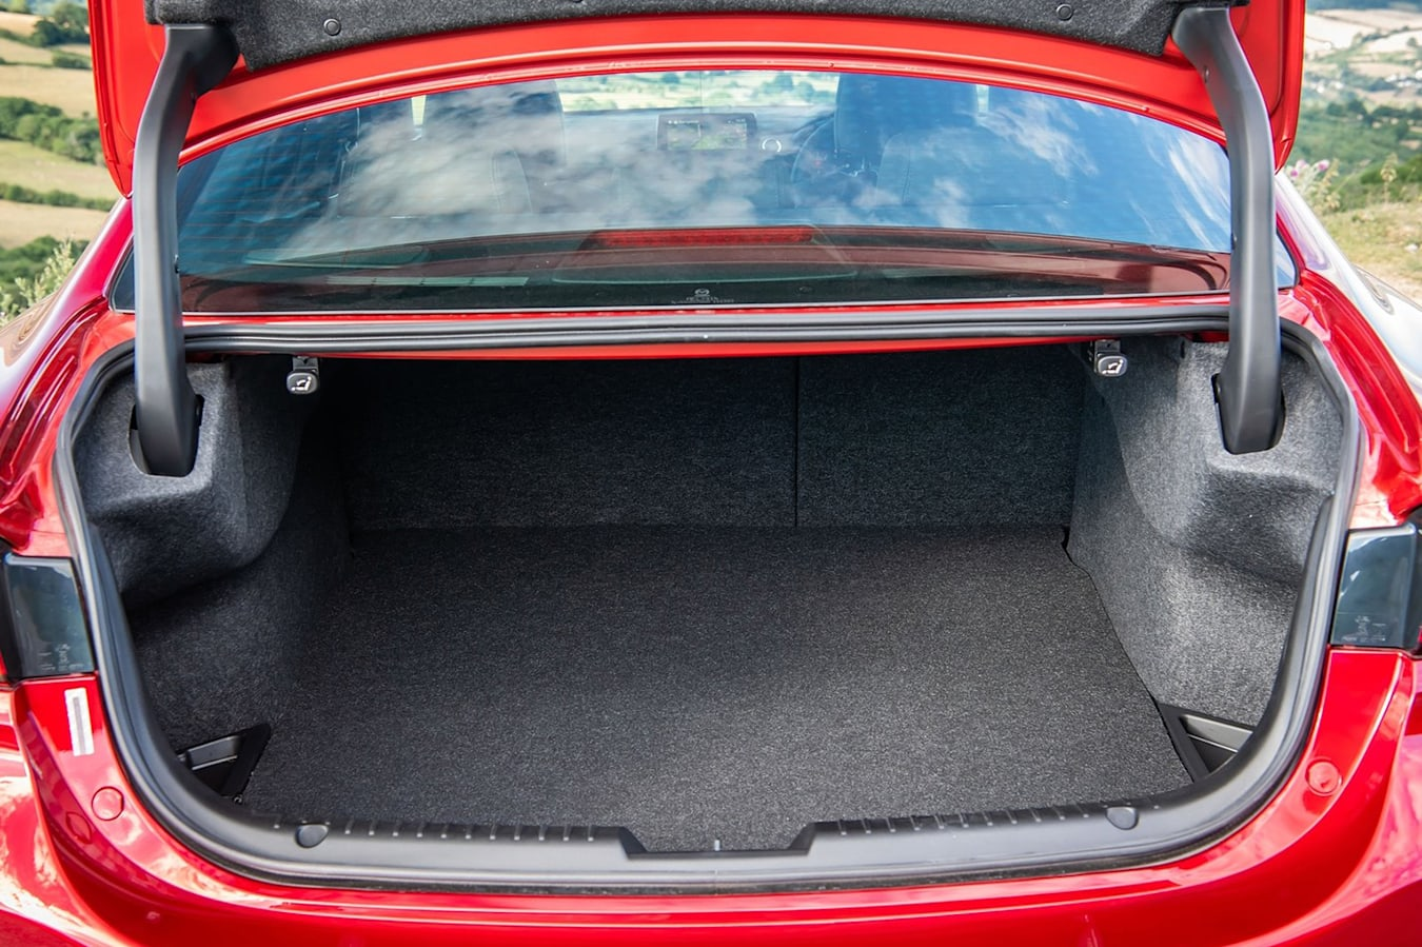 Mazda 6 boot